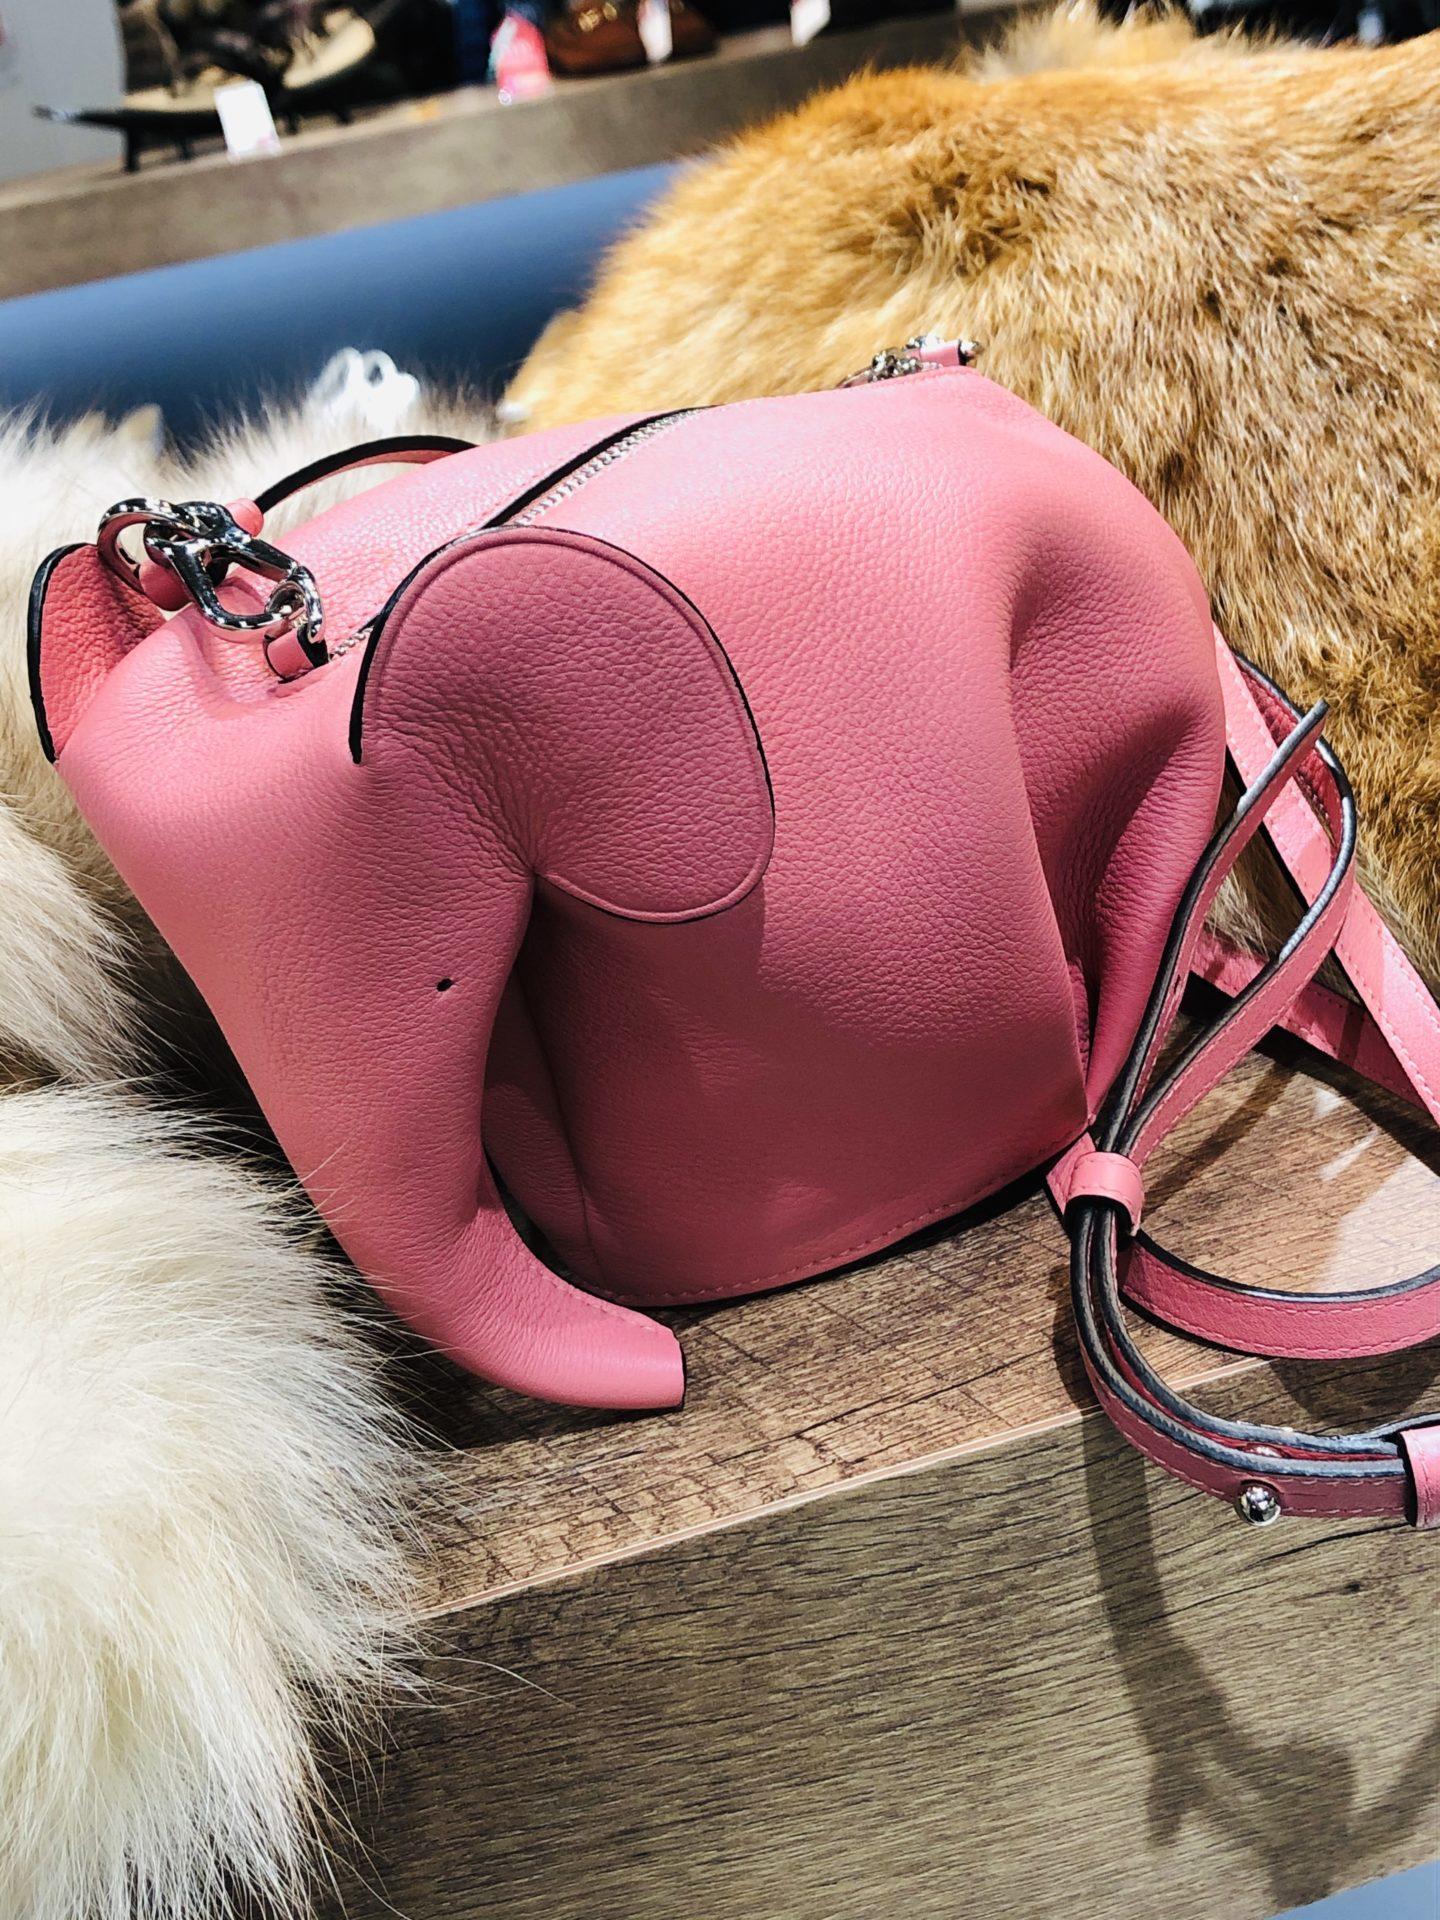 【LOEWE エレファントミニショルダーバッグ】をお買い取りさせていただきました!